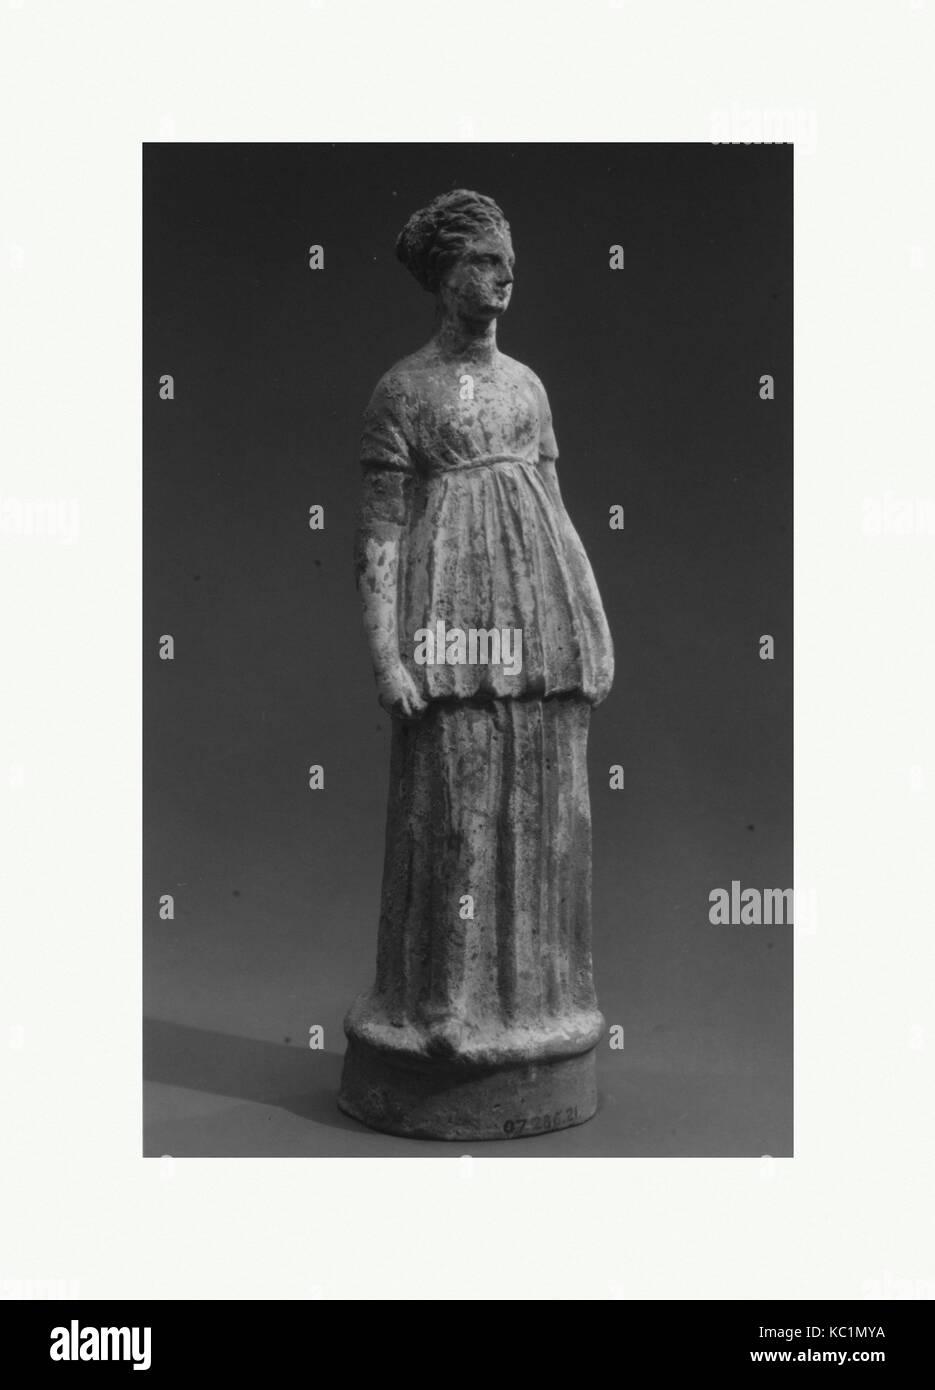 Terracotta statuette of a girl, Hellenistic, 3rd century B.C., Greek, Corinthian, Terracotta, H.: 9 in. (22.9 cm), - Stock Image